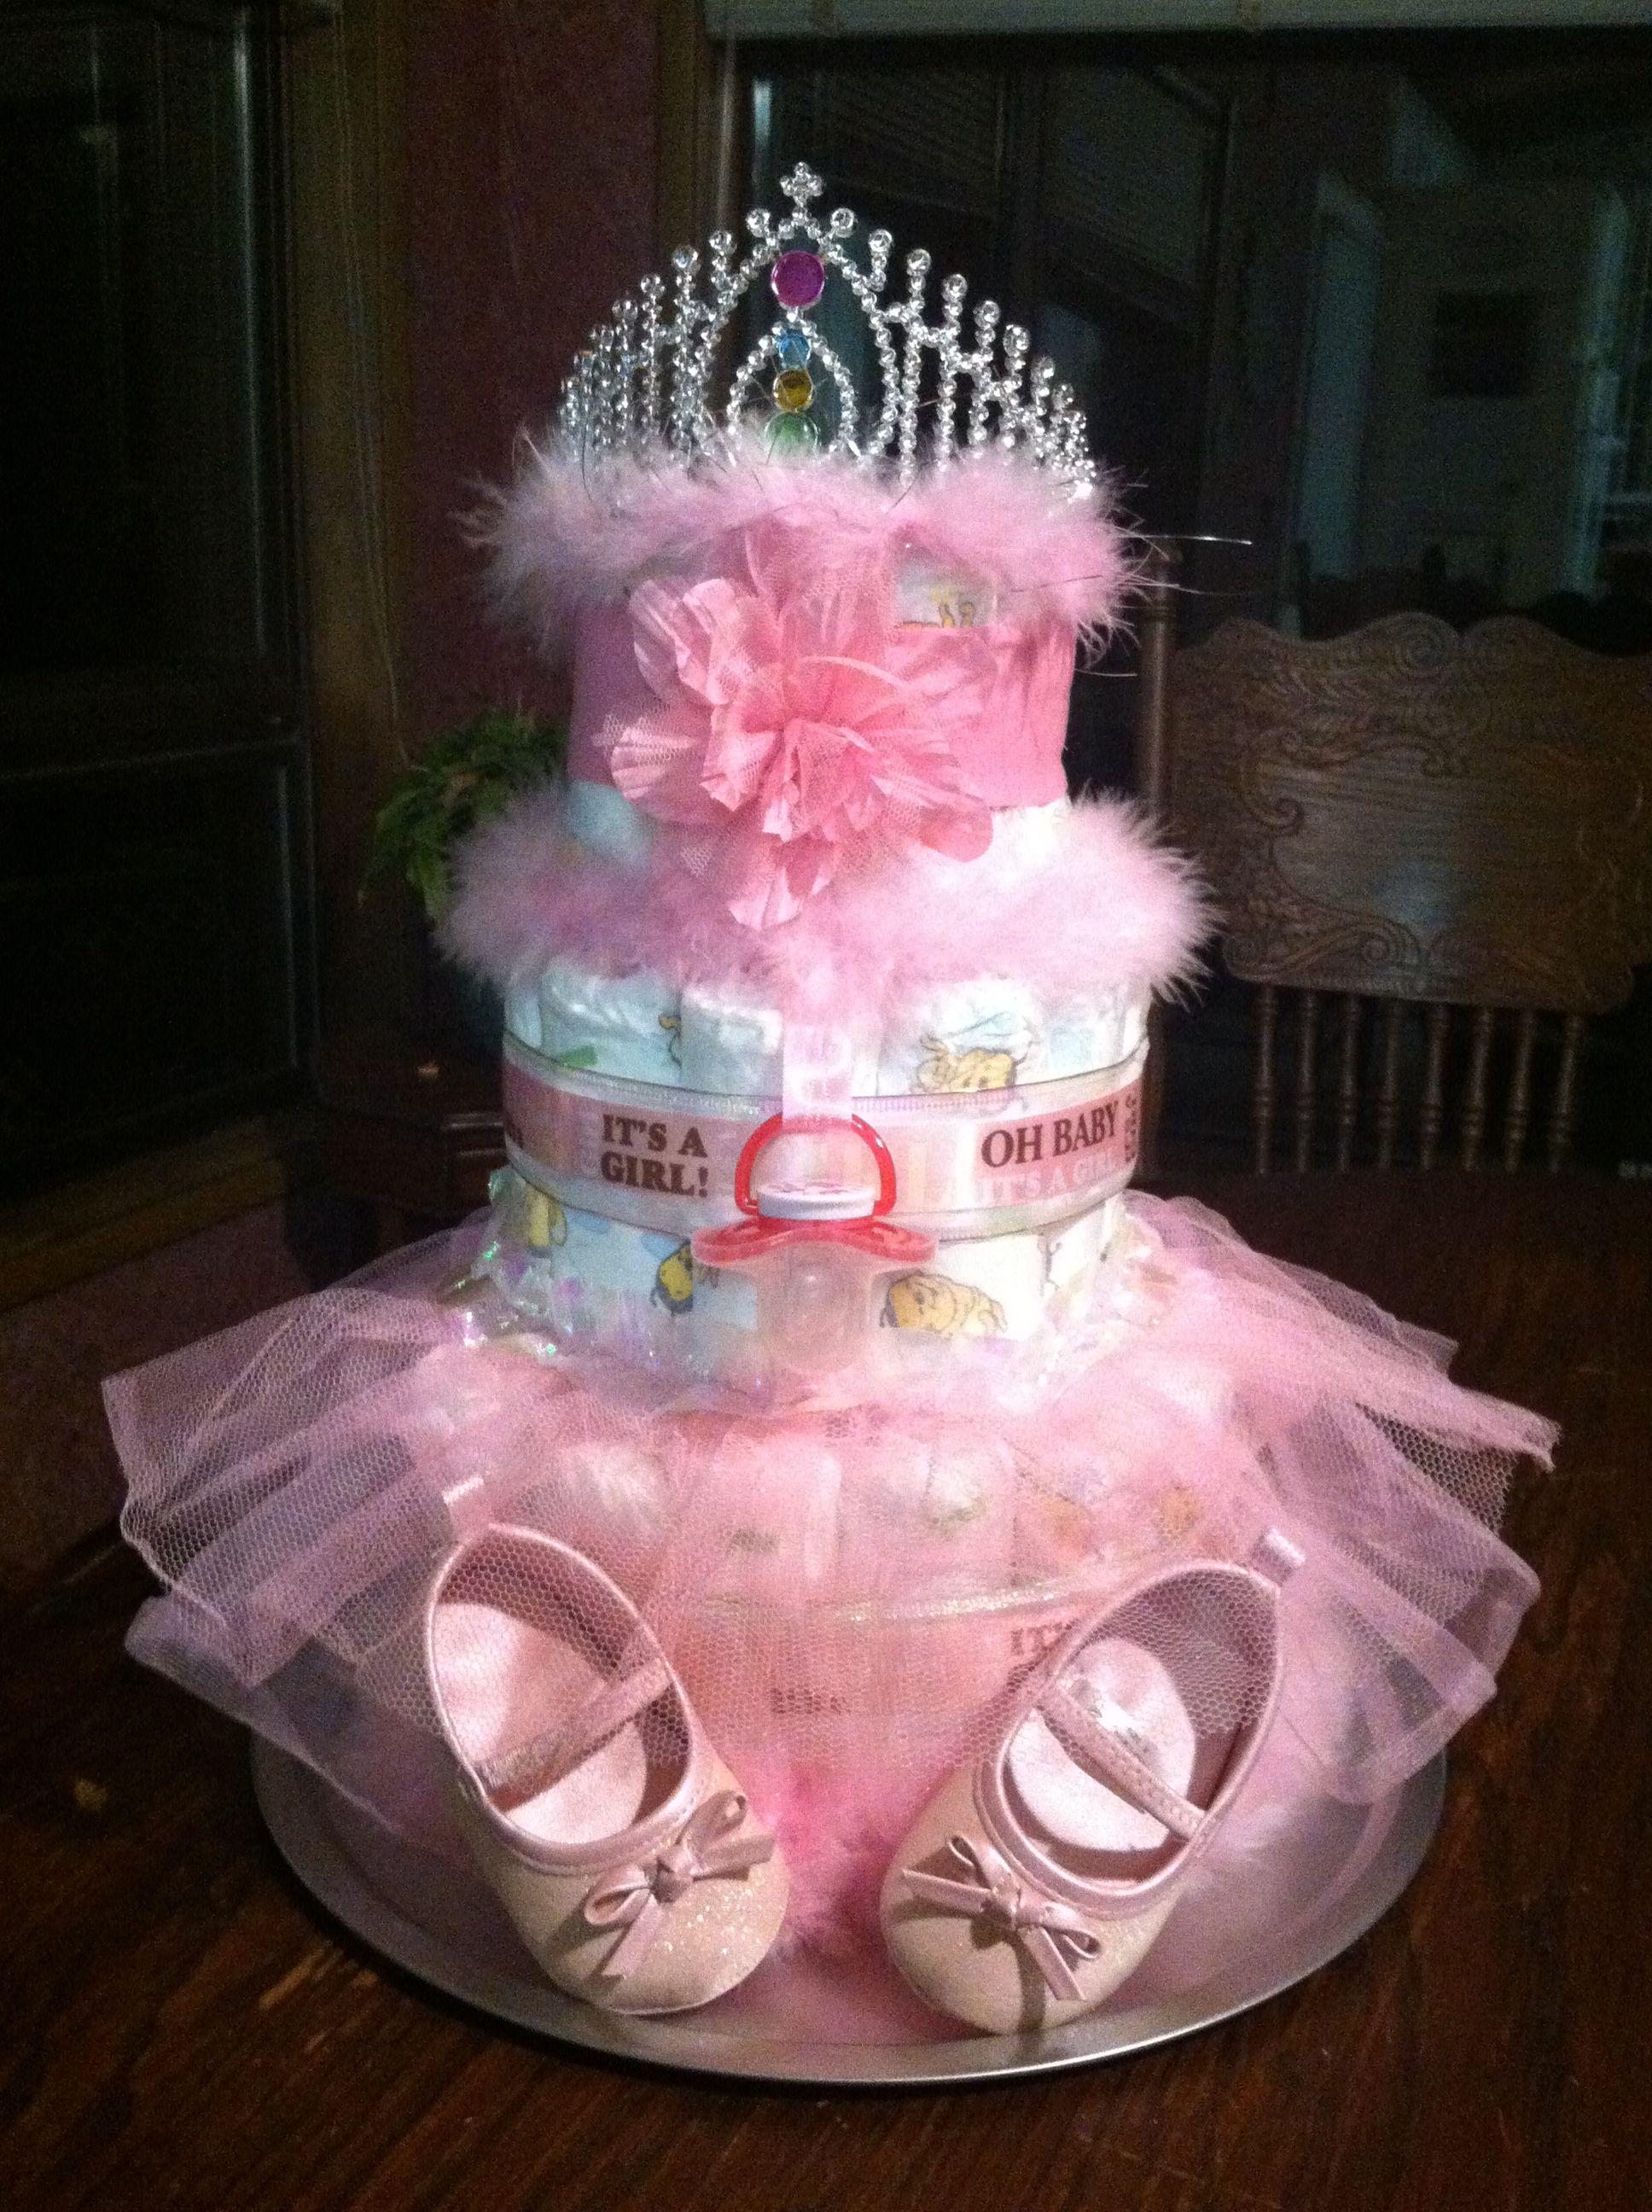 Ballerina Princess Diaper Cake By Ashlie Pieren Goetze